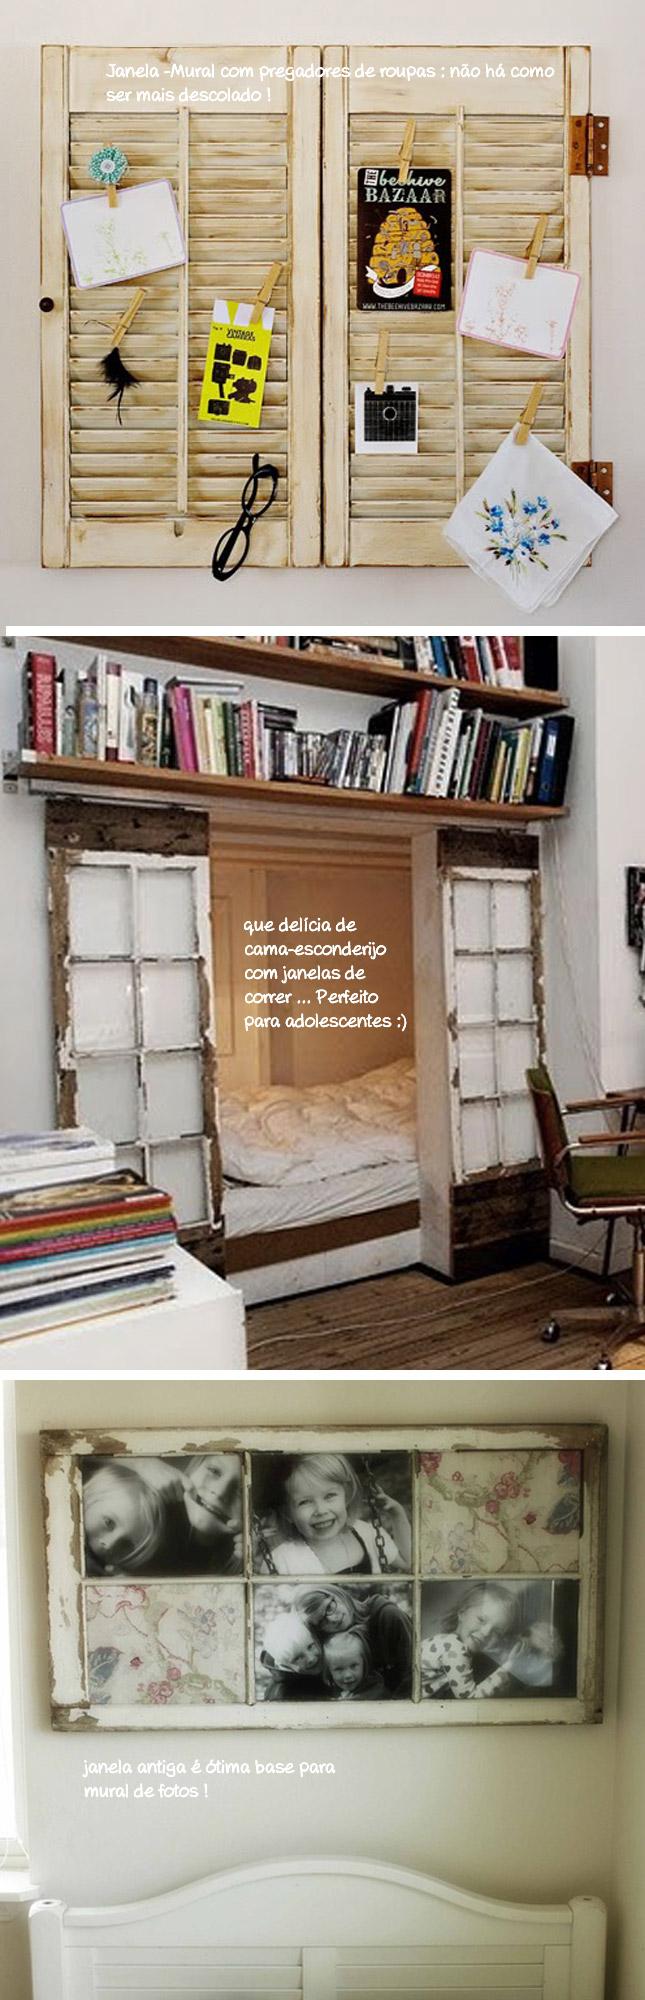 decoradornet-janelas-reinventadas-3